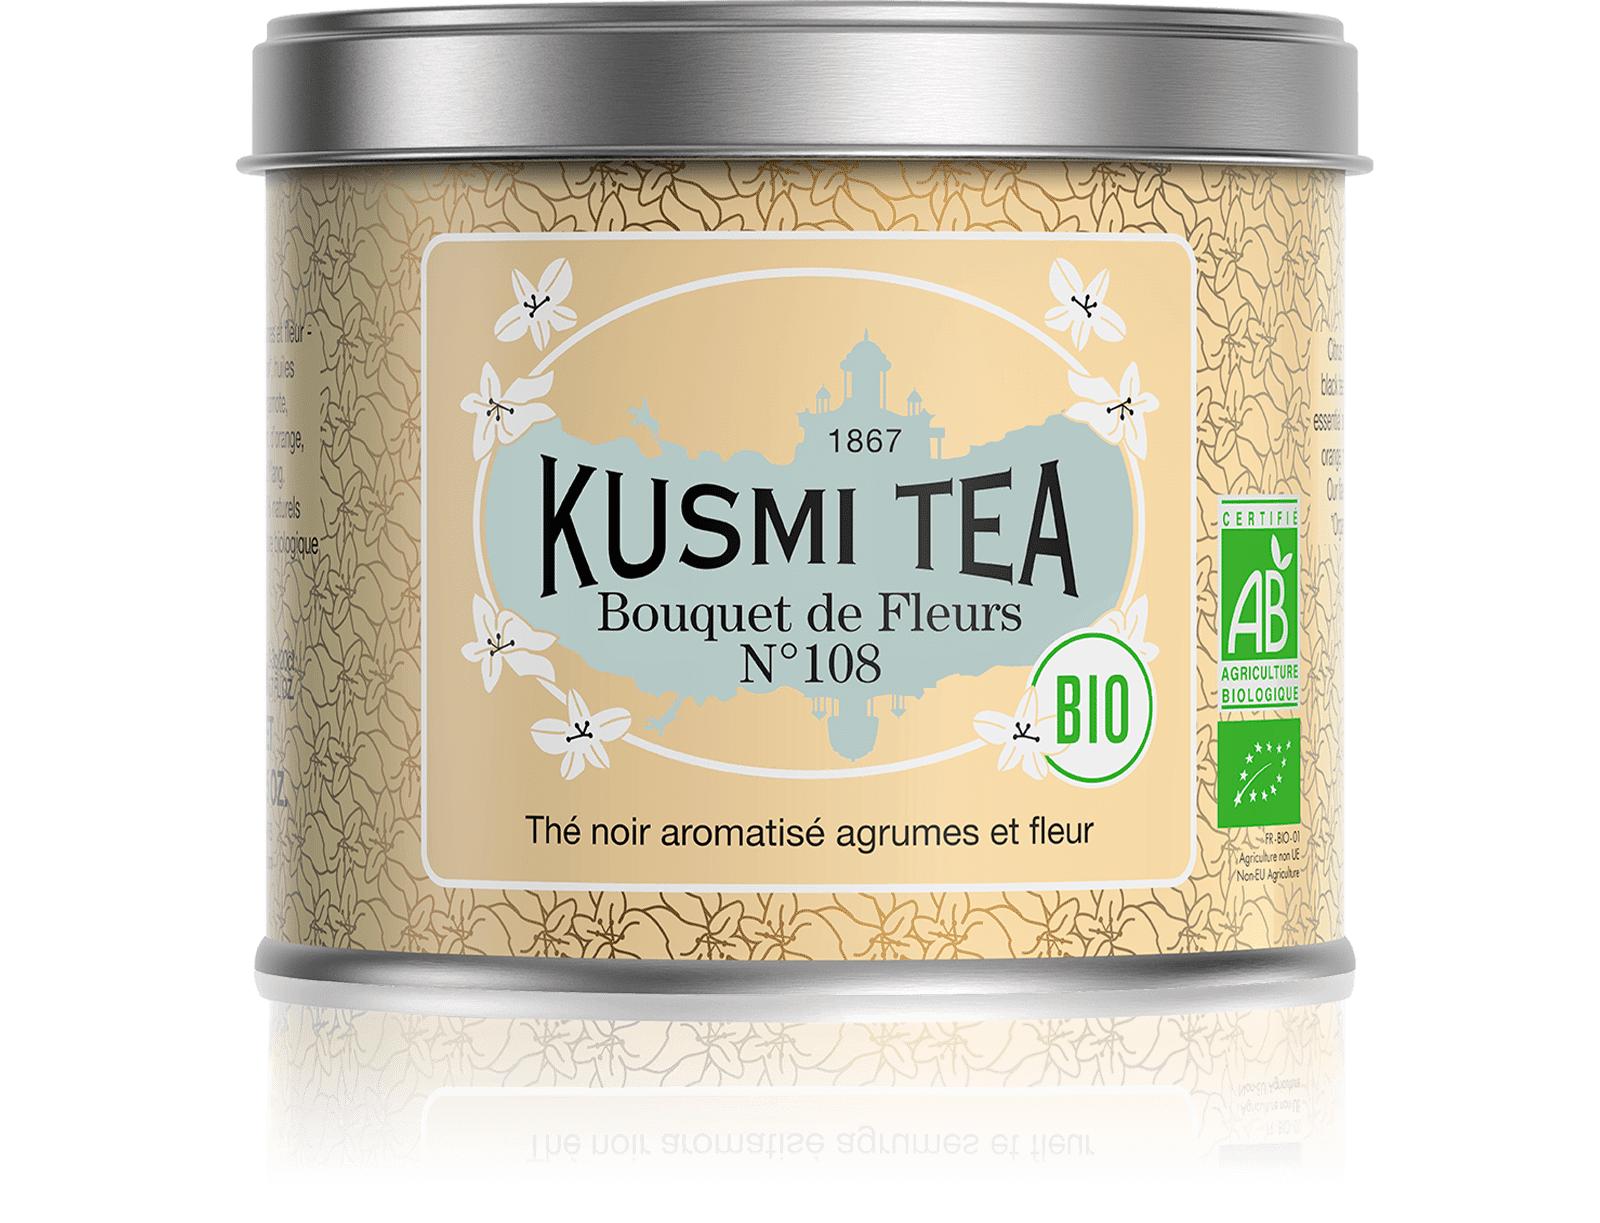 KUSMI TEA Bouquet de Fleurs N°108 bio - Thé earl grey, fleur Ylang-Ylang - Kusmi Tea